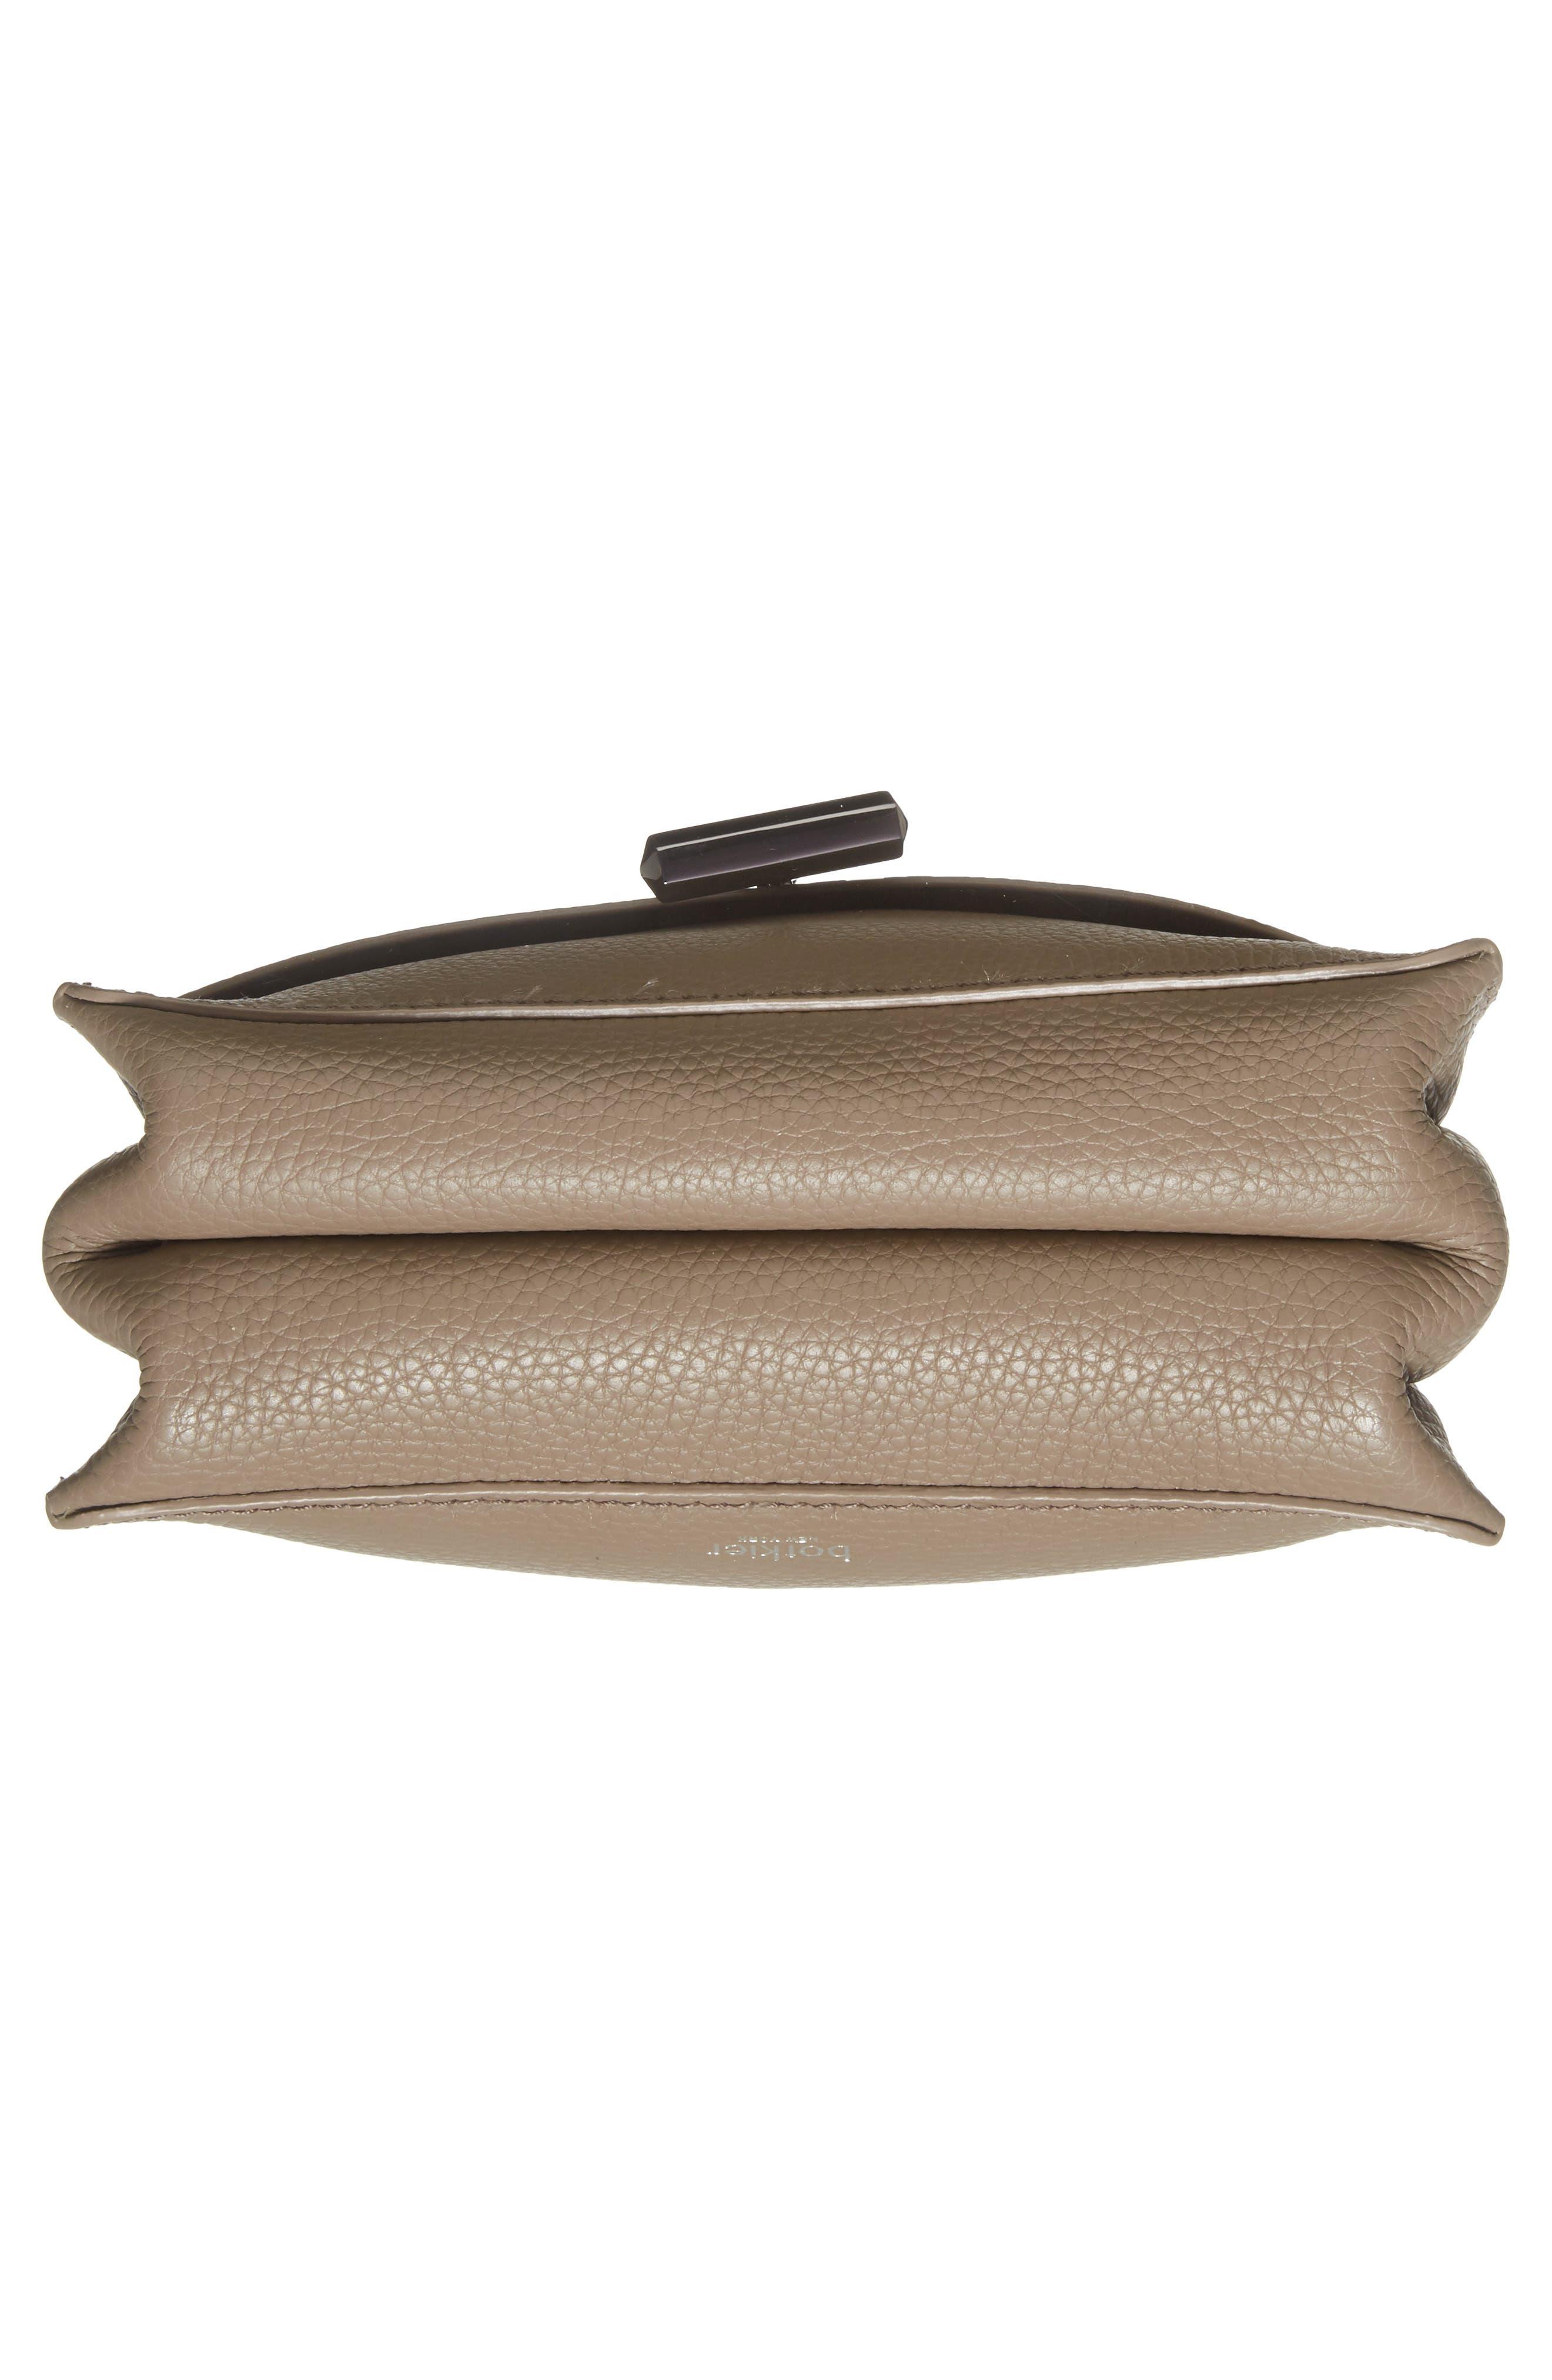 Waverly Leather Crossbody Bag,                             Alternate thumbnail 34, color,